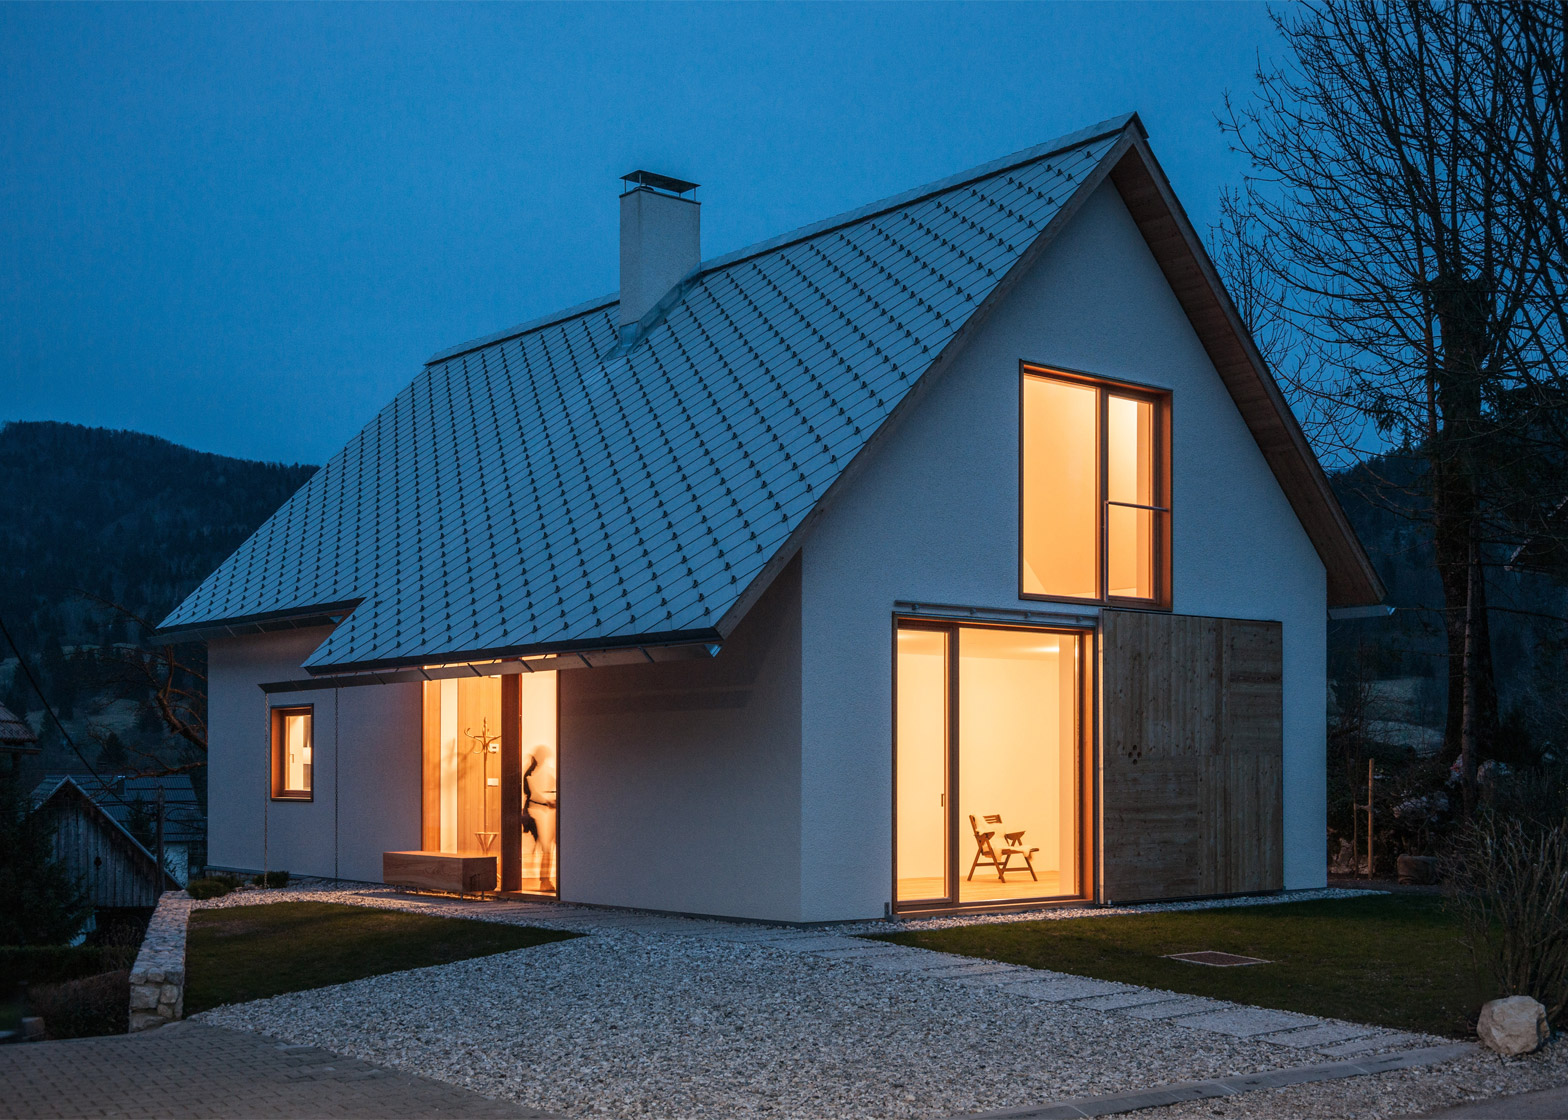 Beautiful alpine house in slovenia by skupaj arhitekti for Alpine house plans